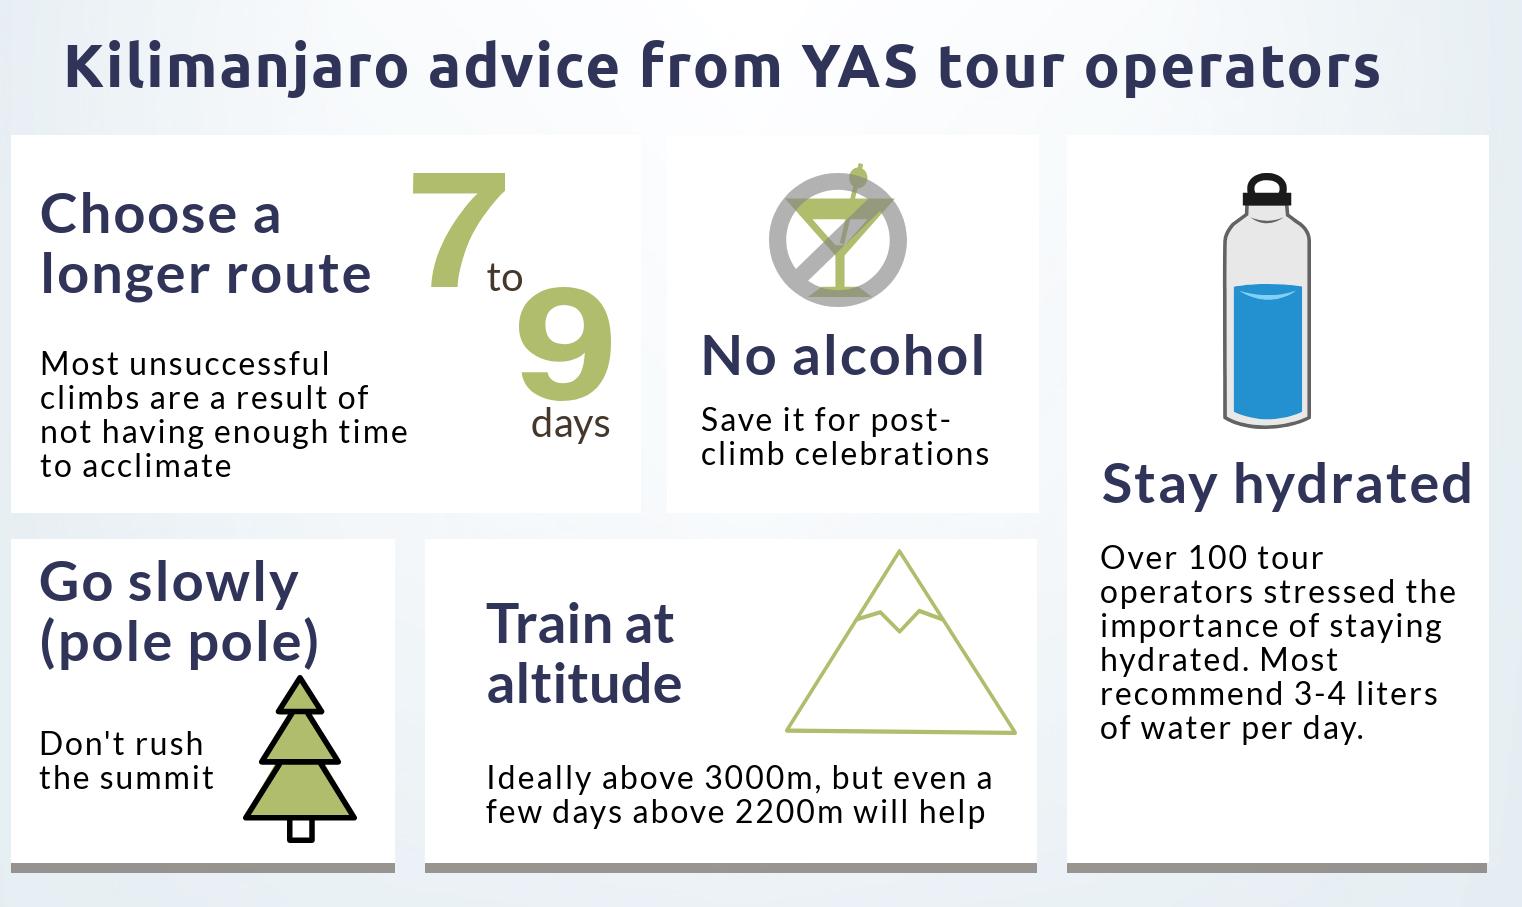 Kilimanjaro advice